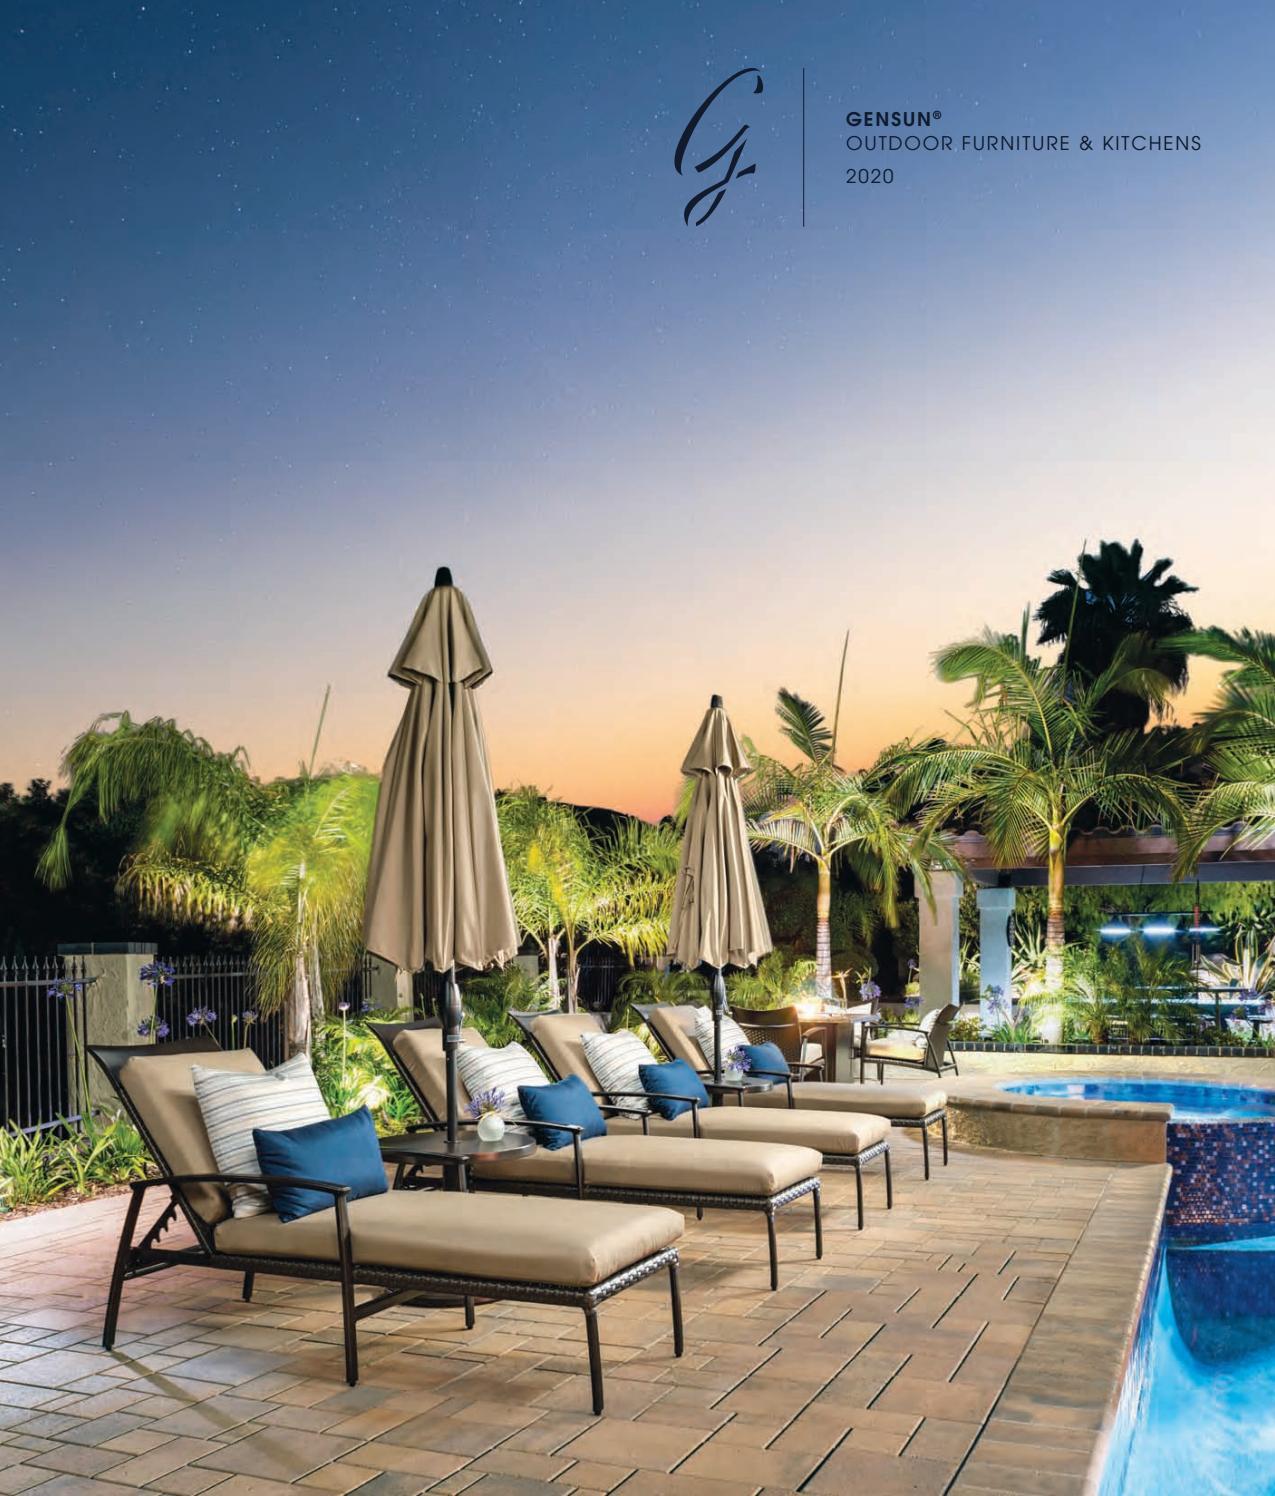 2020 gensun casual outdoor furniture